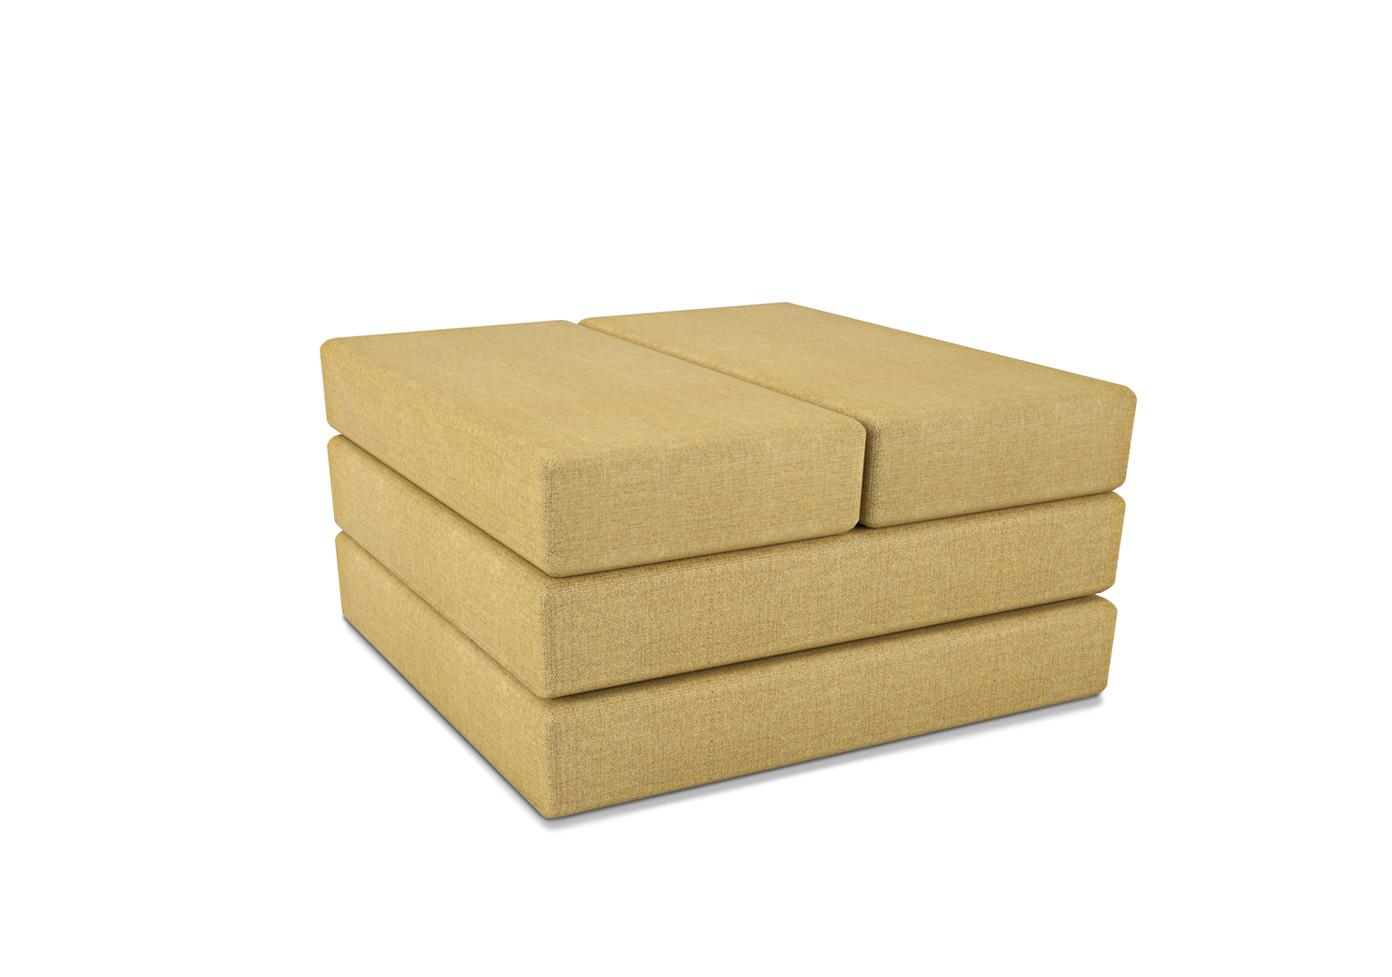 dodeka- lemma side table storage